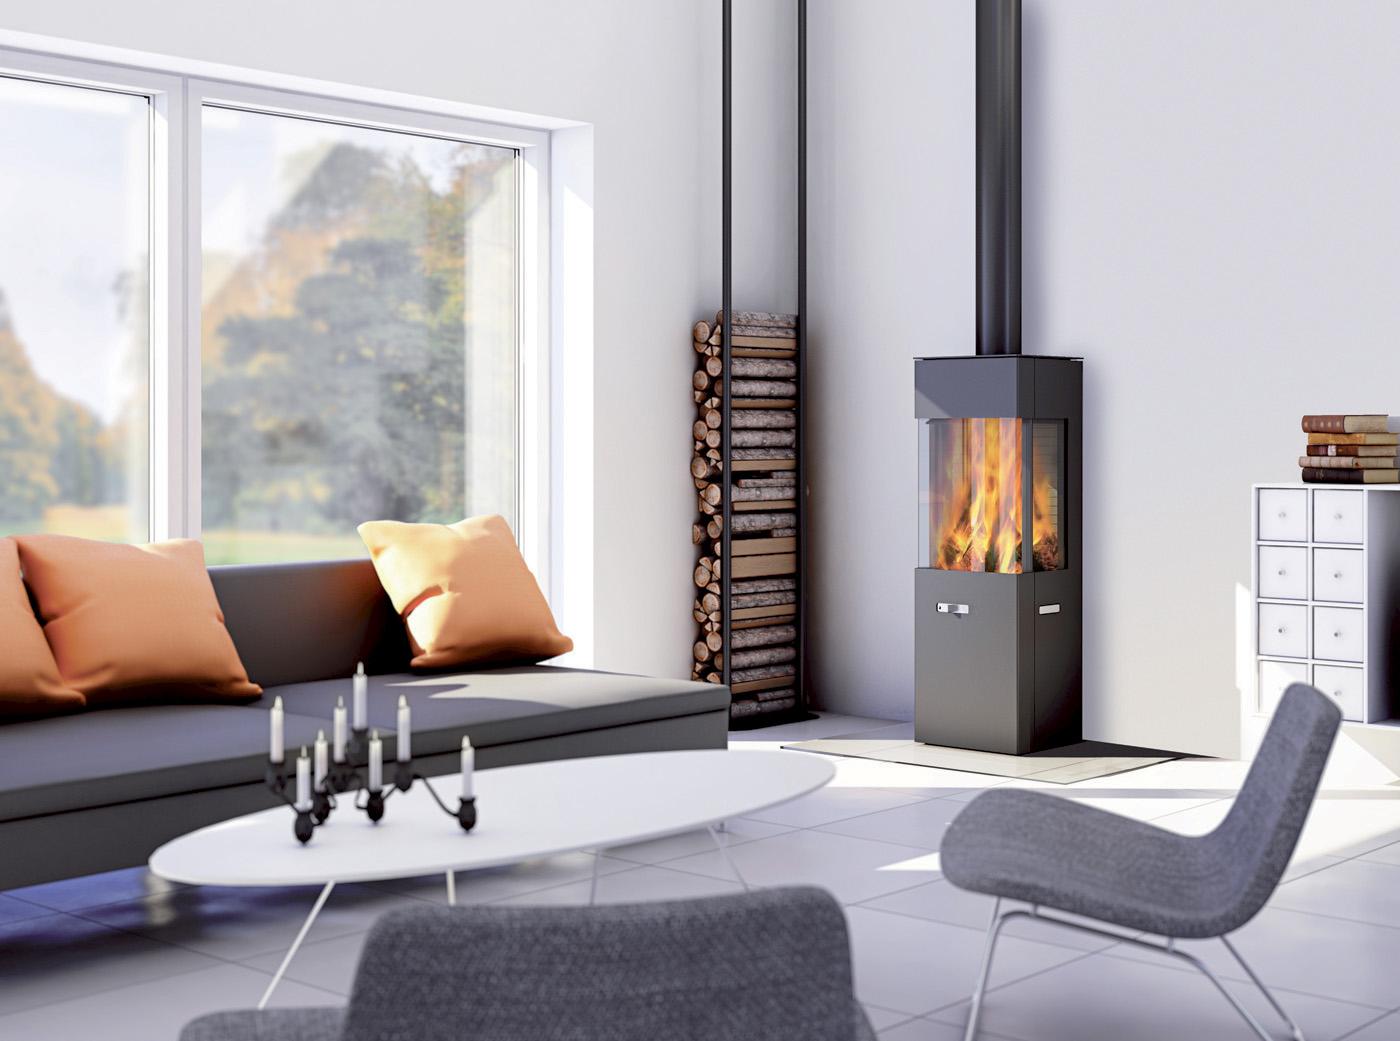 po les attika la culture du feu les performances et le. Black Bedroom Furniture Sets. Home Design Ideas